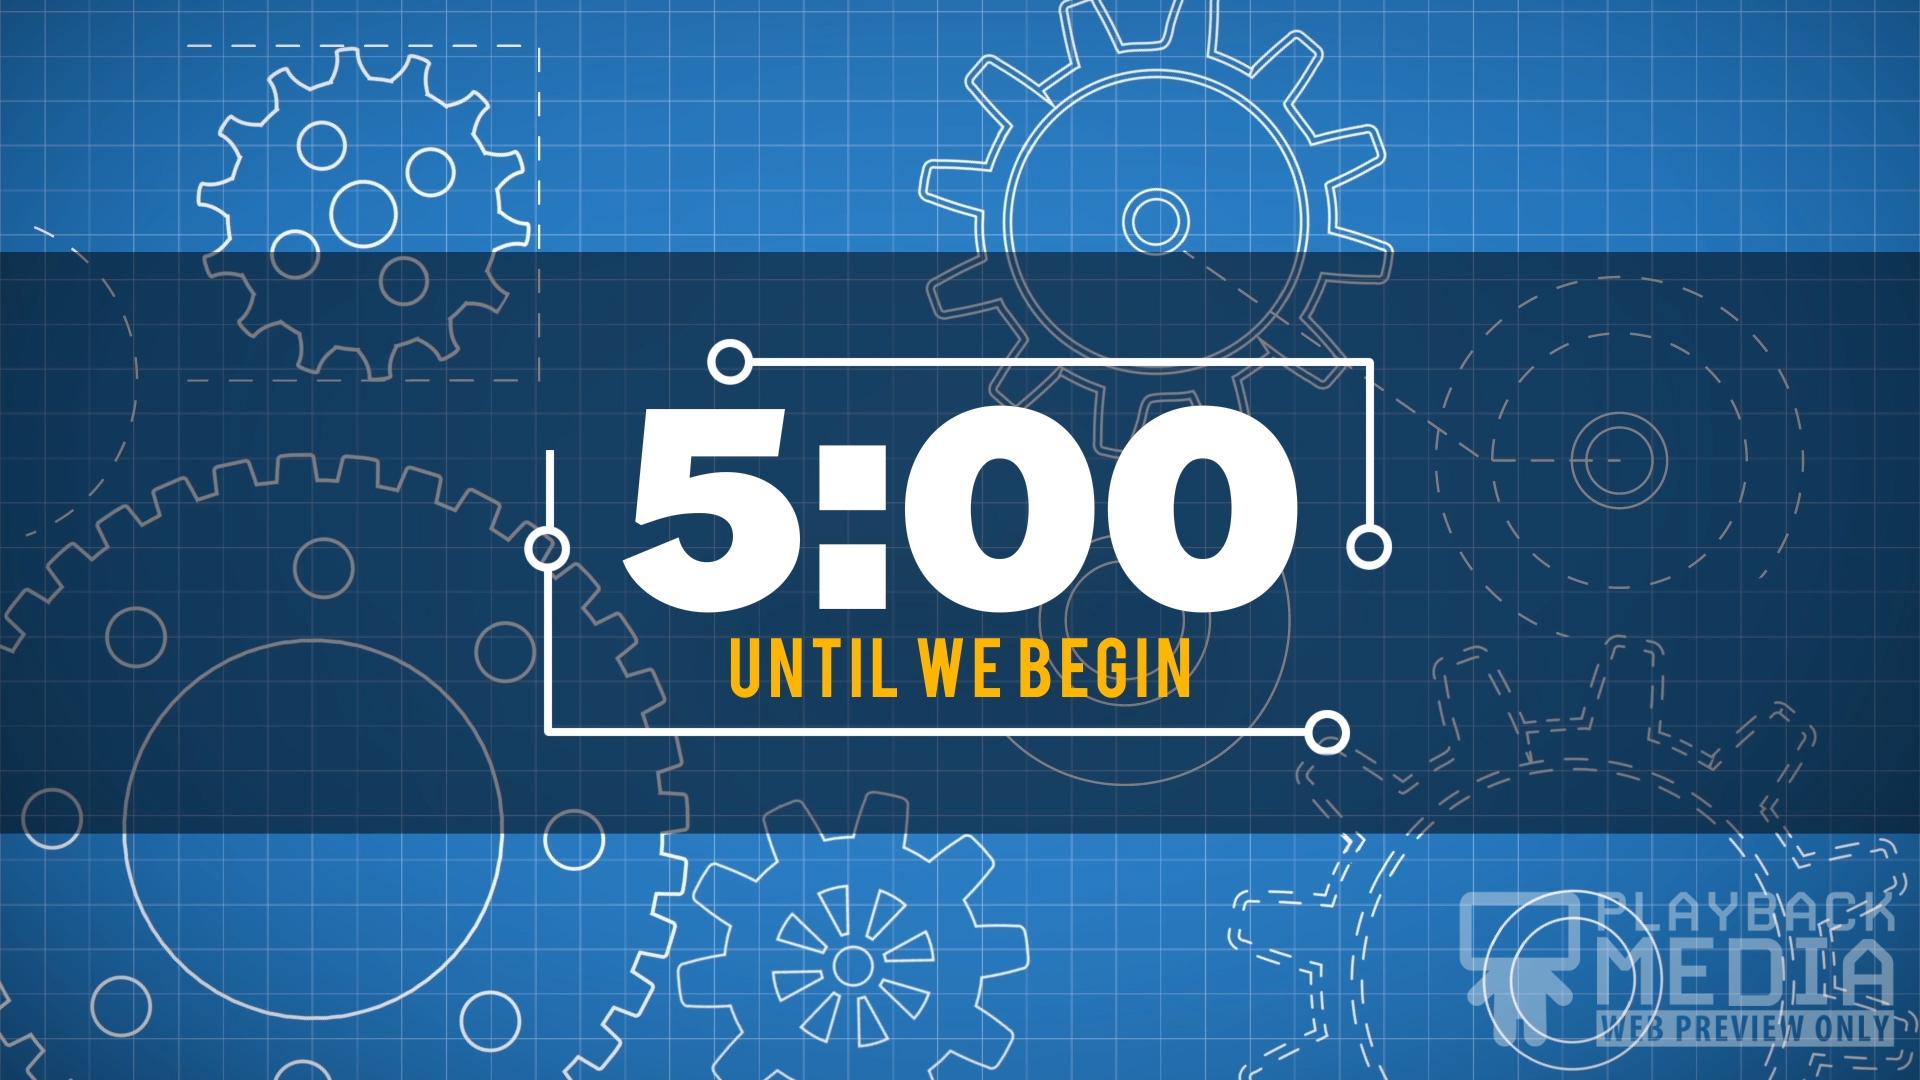 Widgets Countdown Image